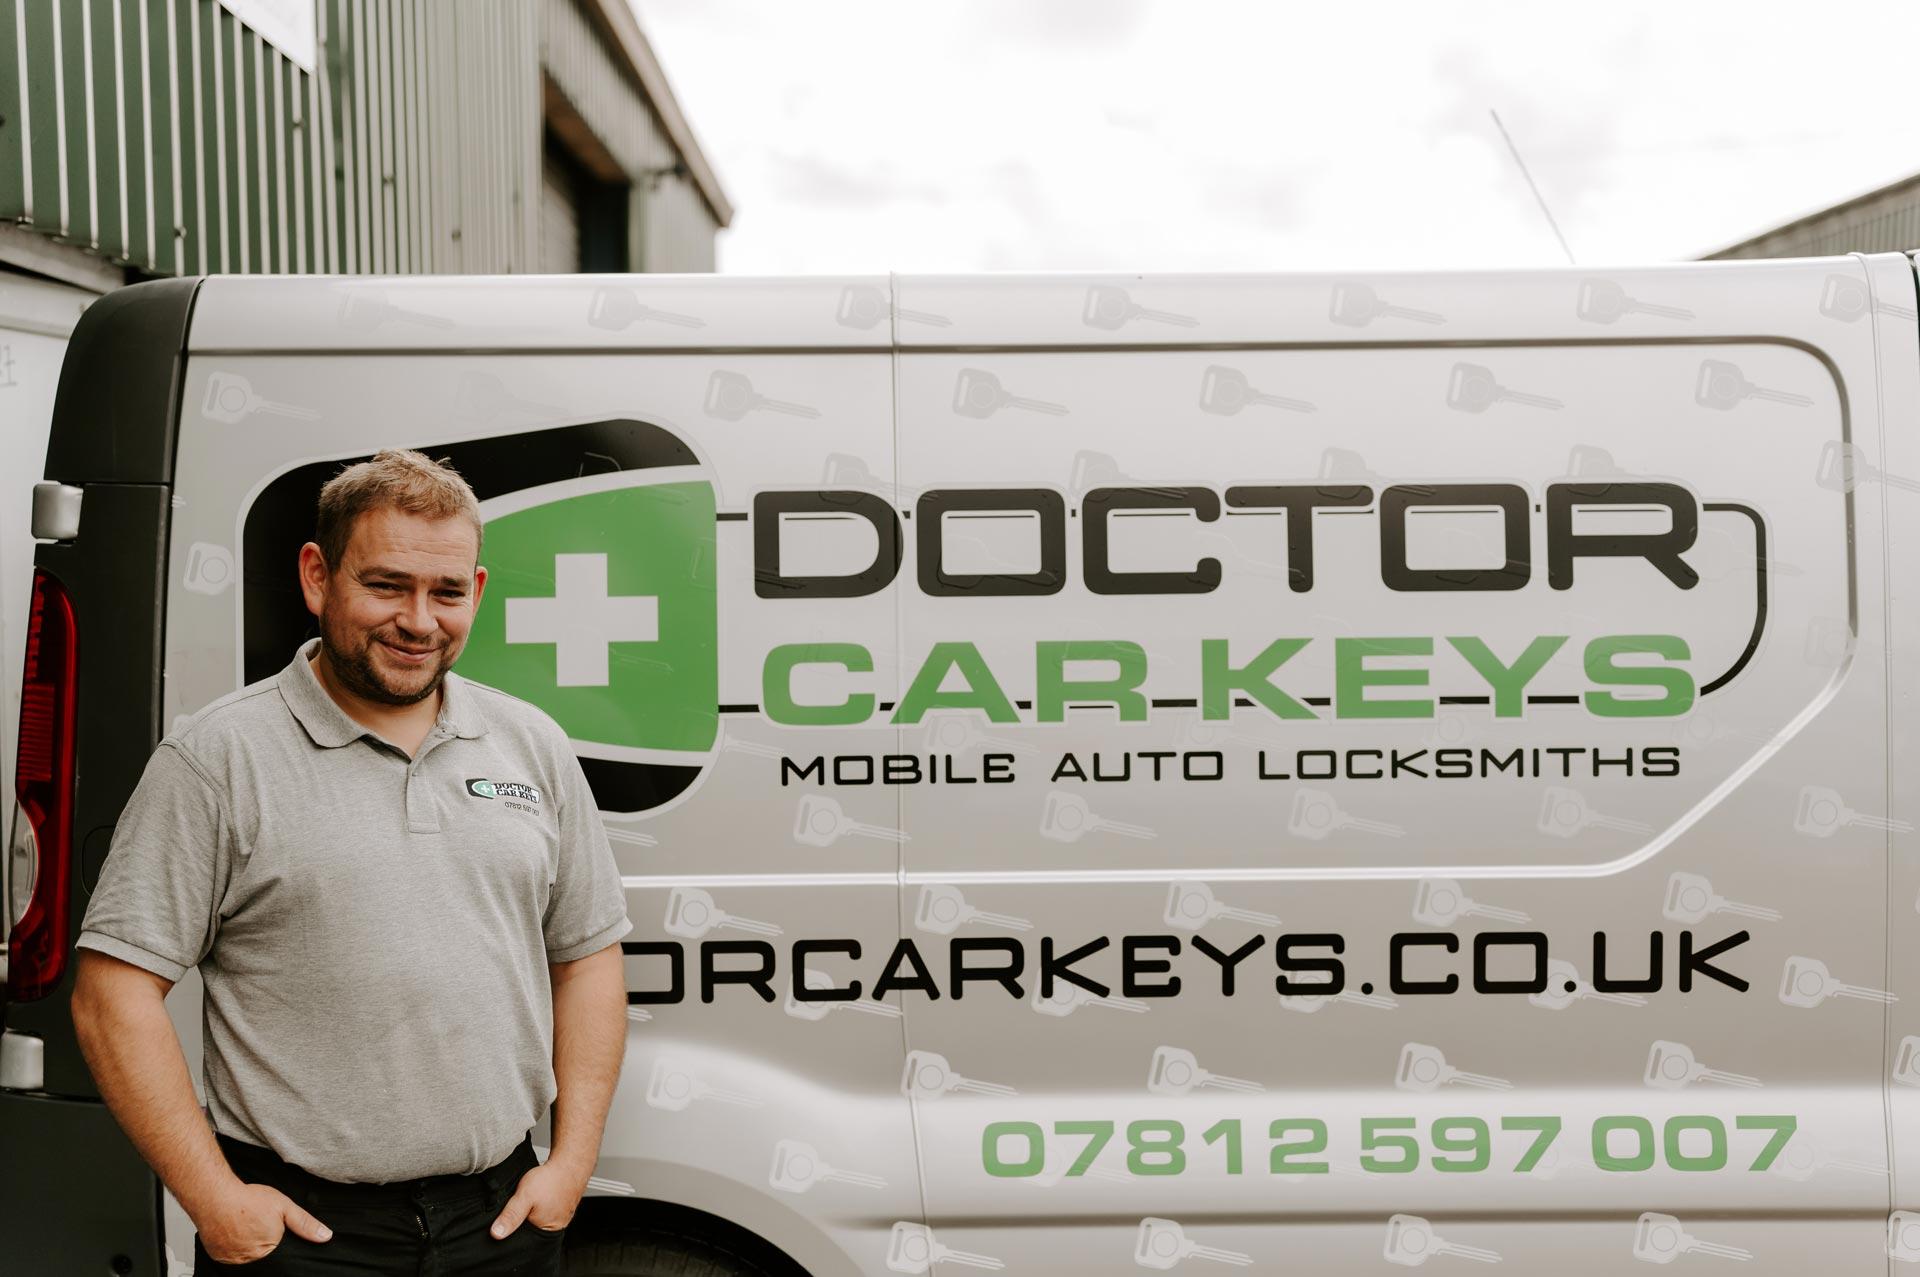 Auto Locksmiths in Woodley